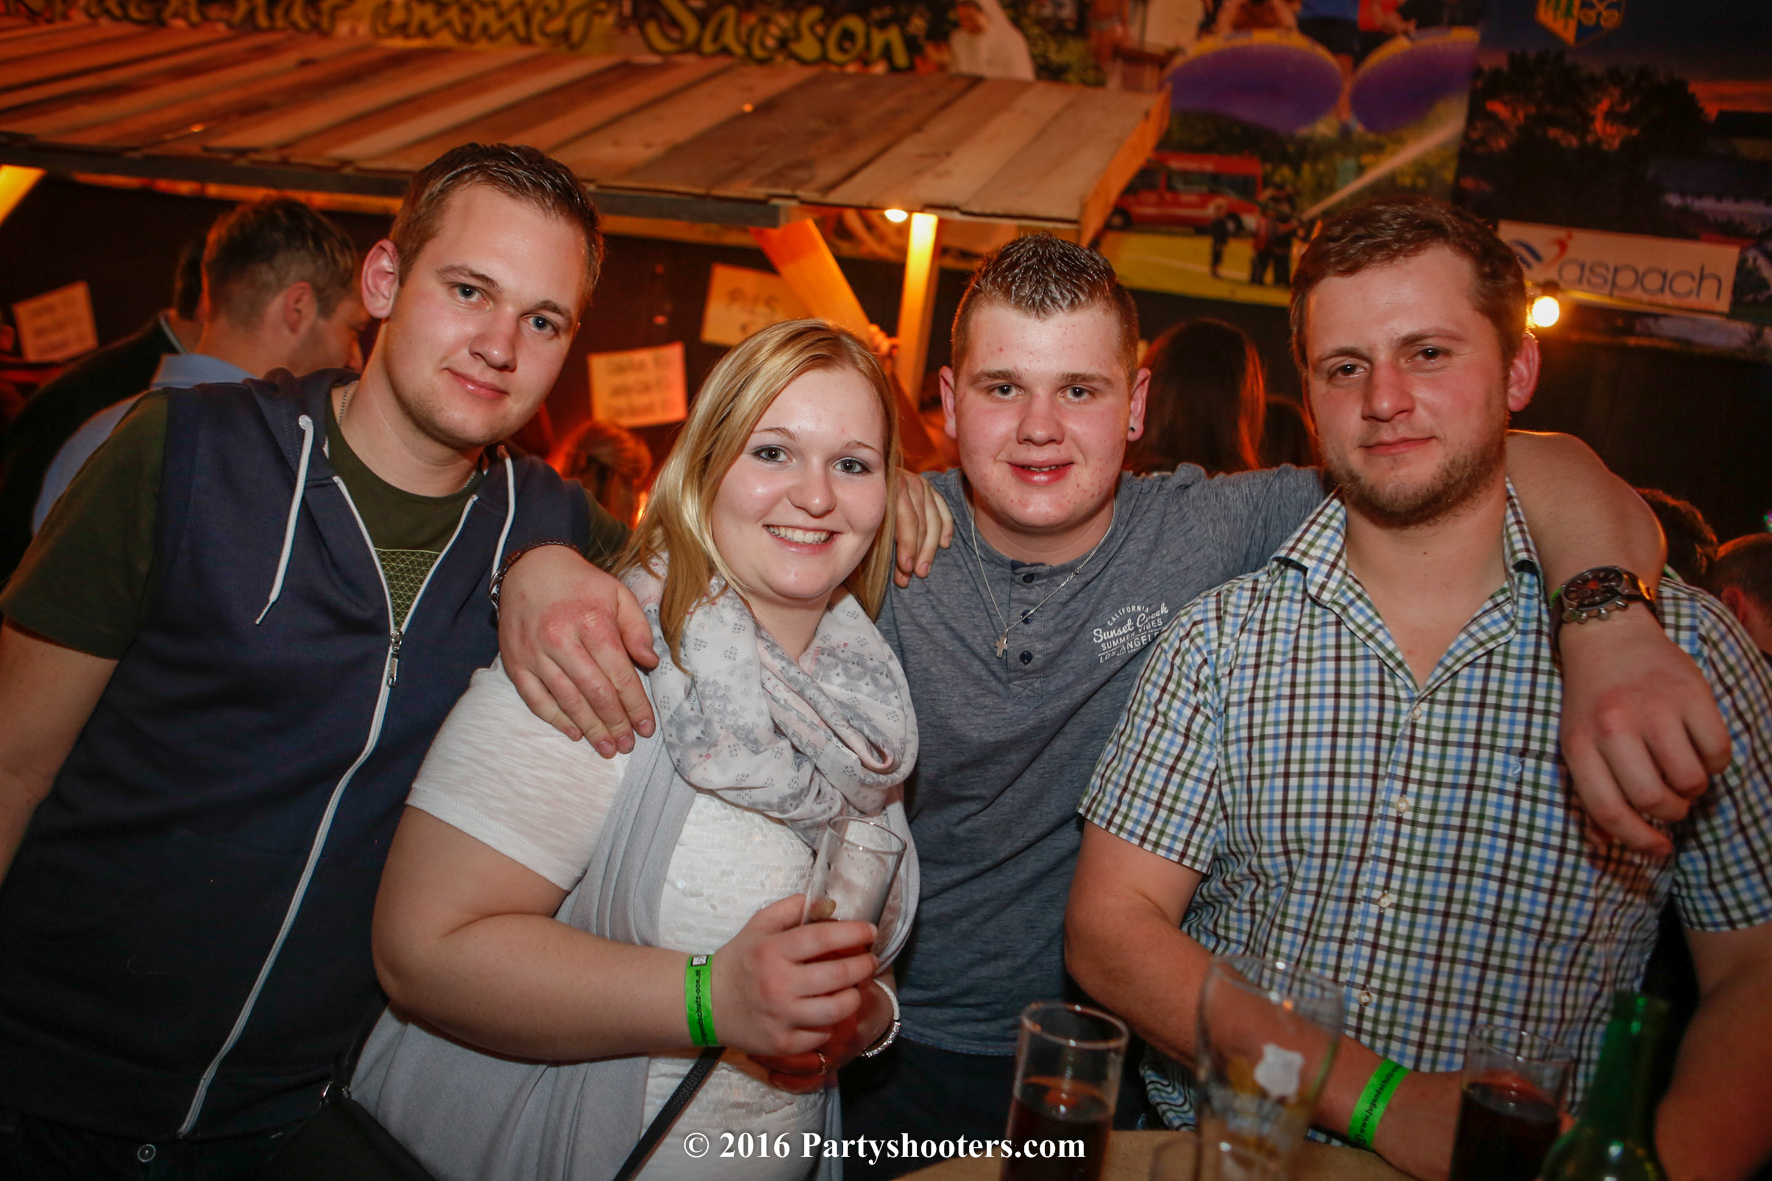 0103 - 4122 - Fruehlingsball Aspach